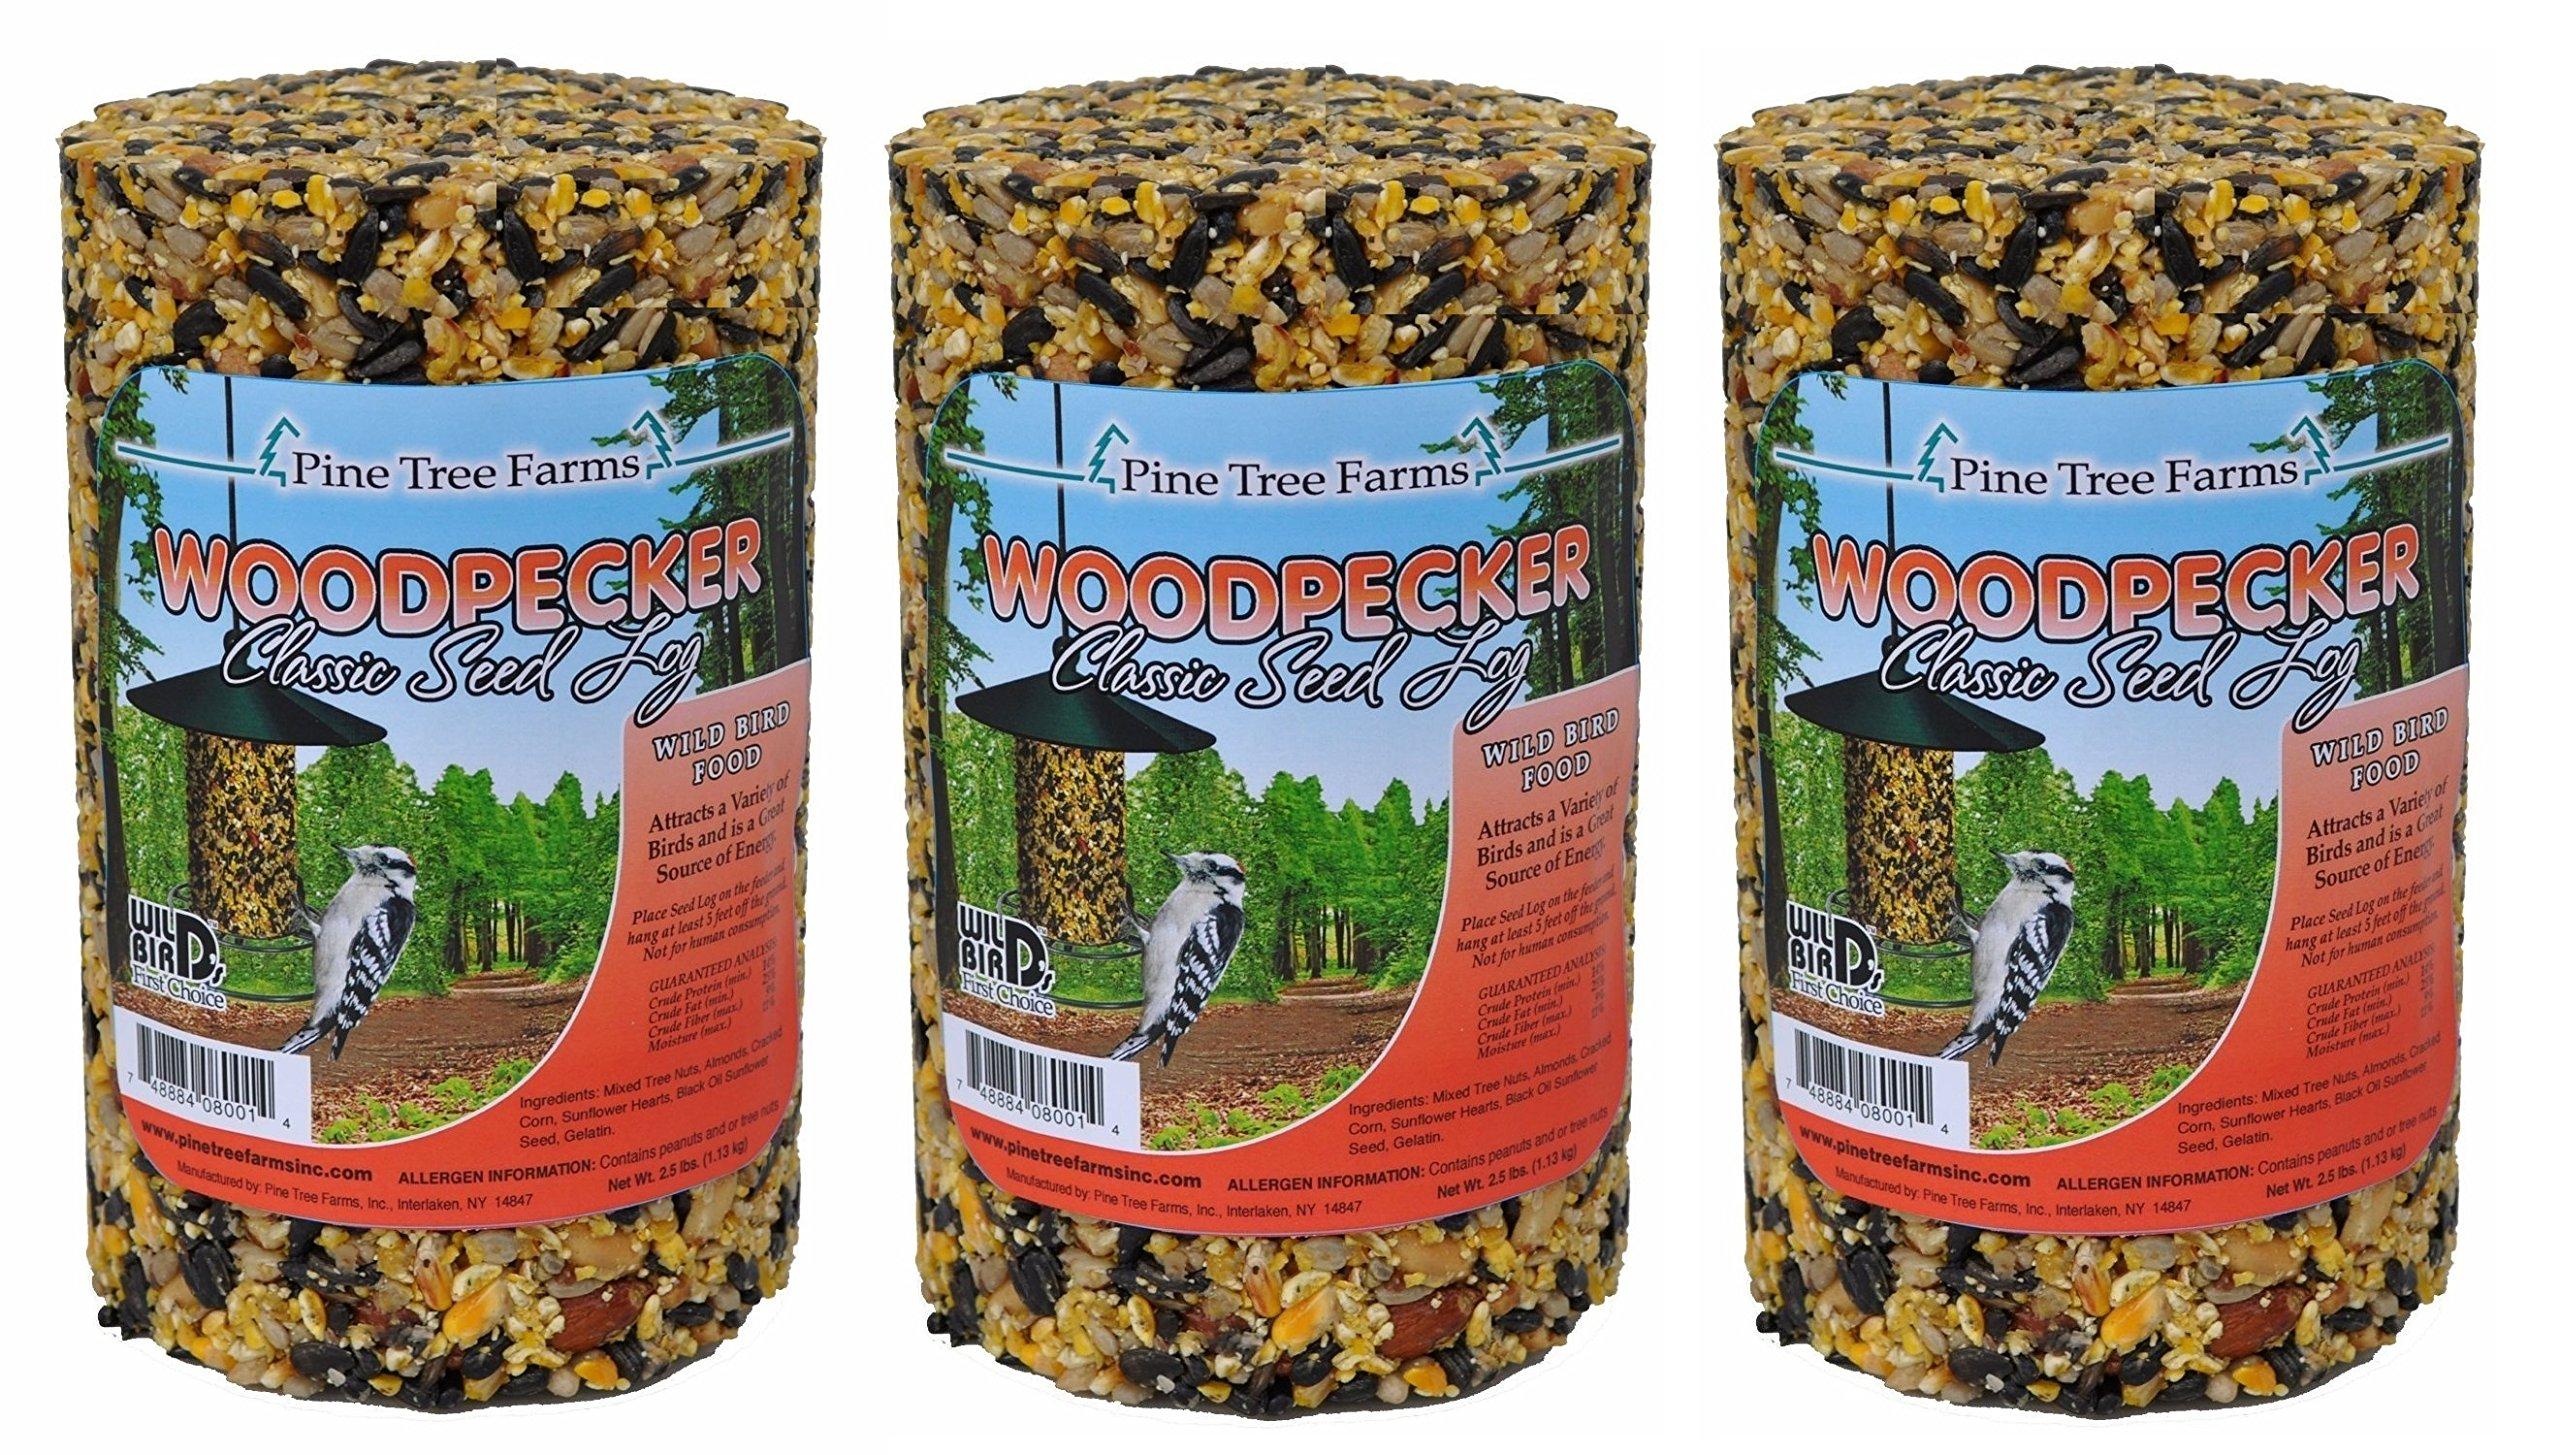 (Pack of 3) Pine Tree Farm Woodpecker Classic Seed Log, 40-Ounce